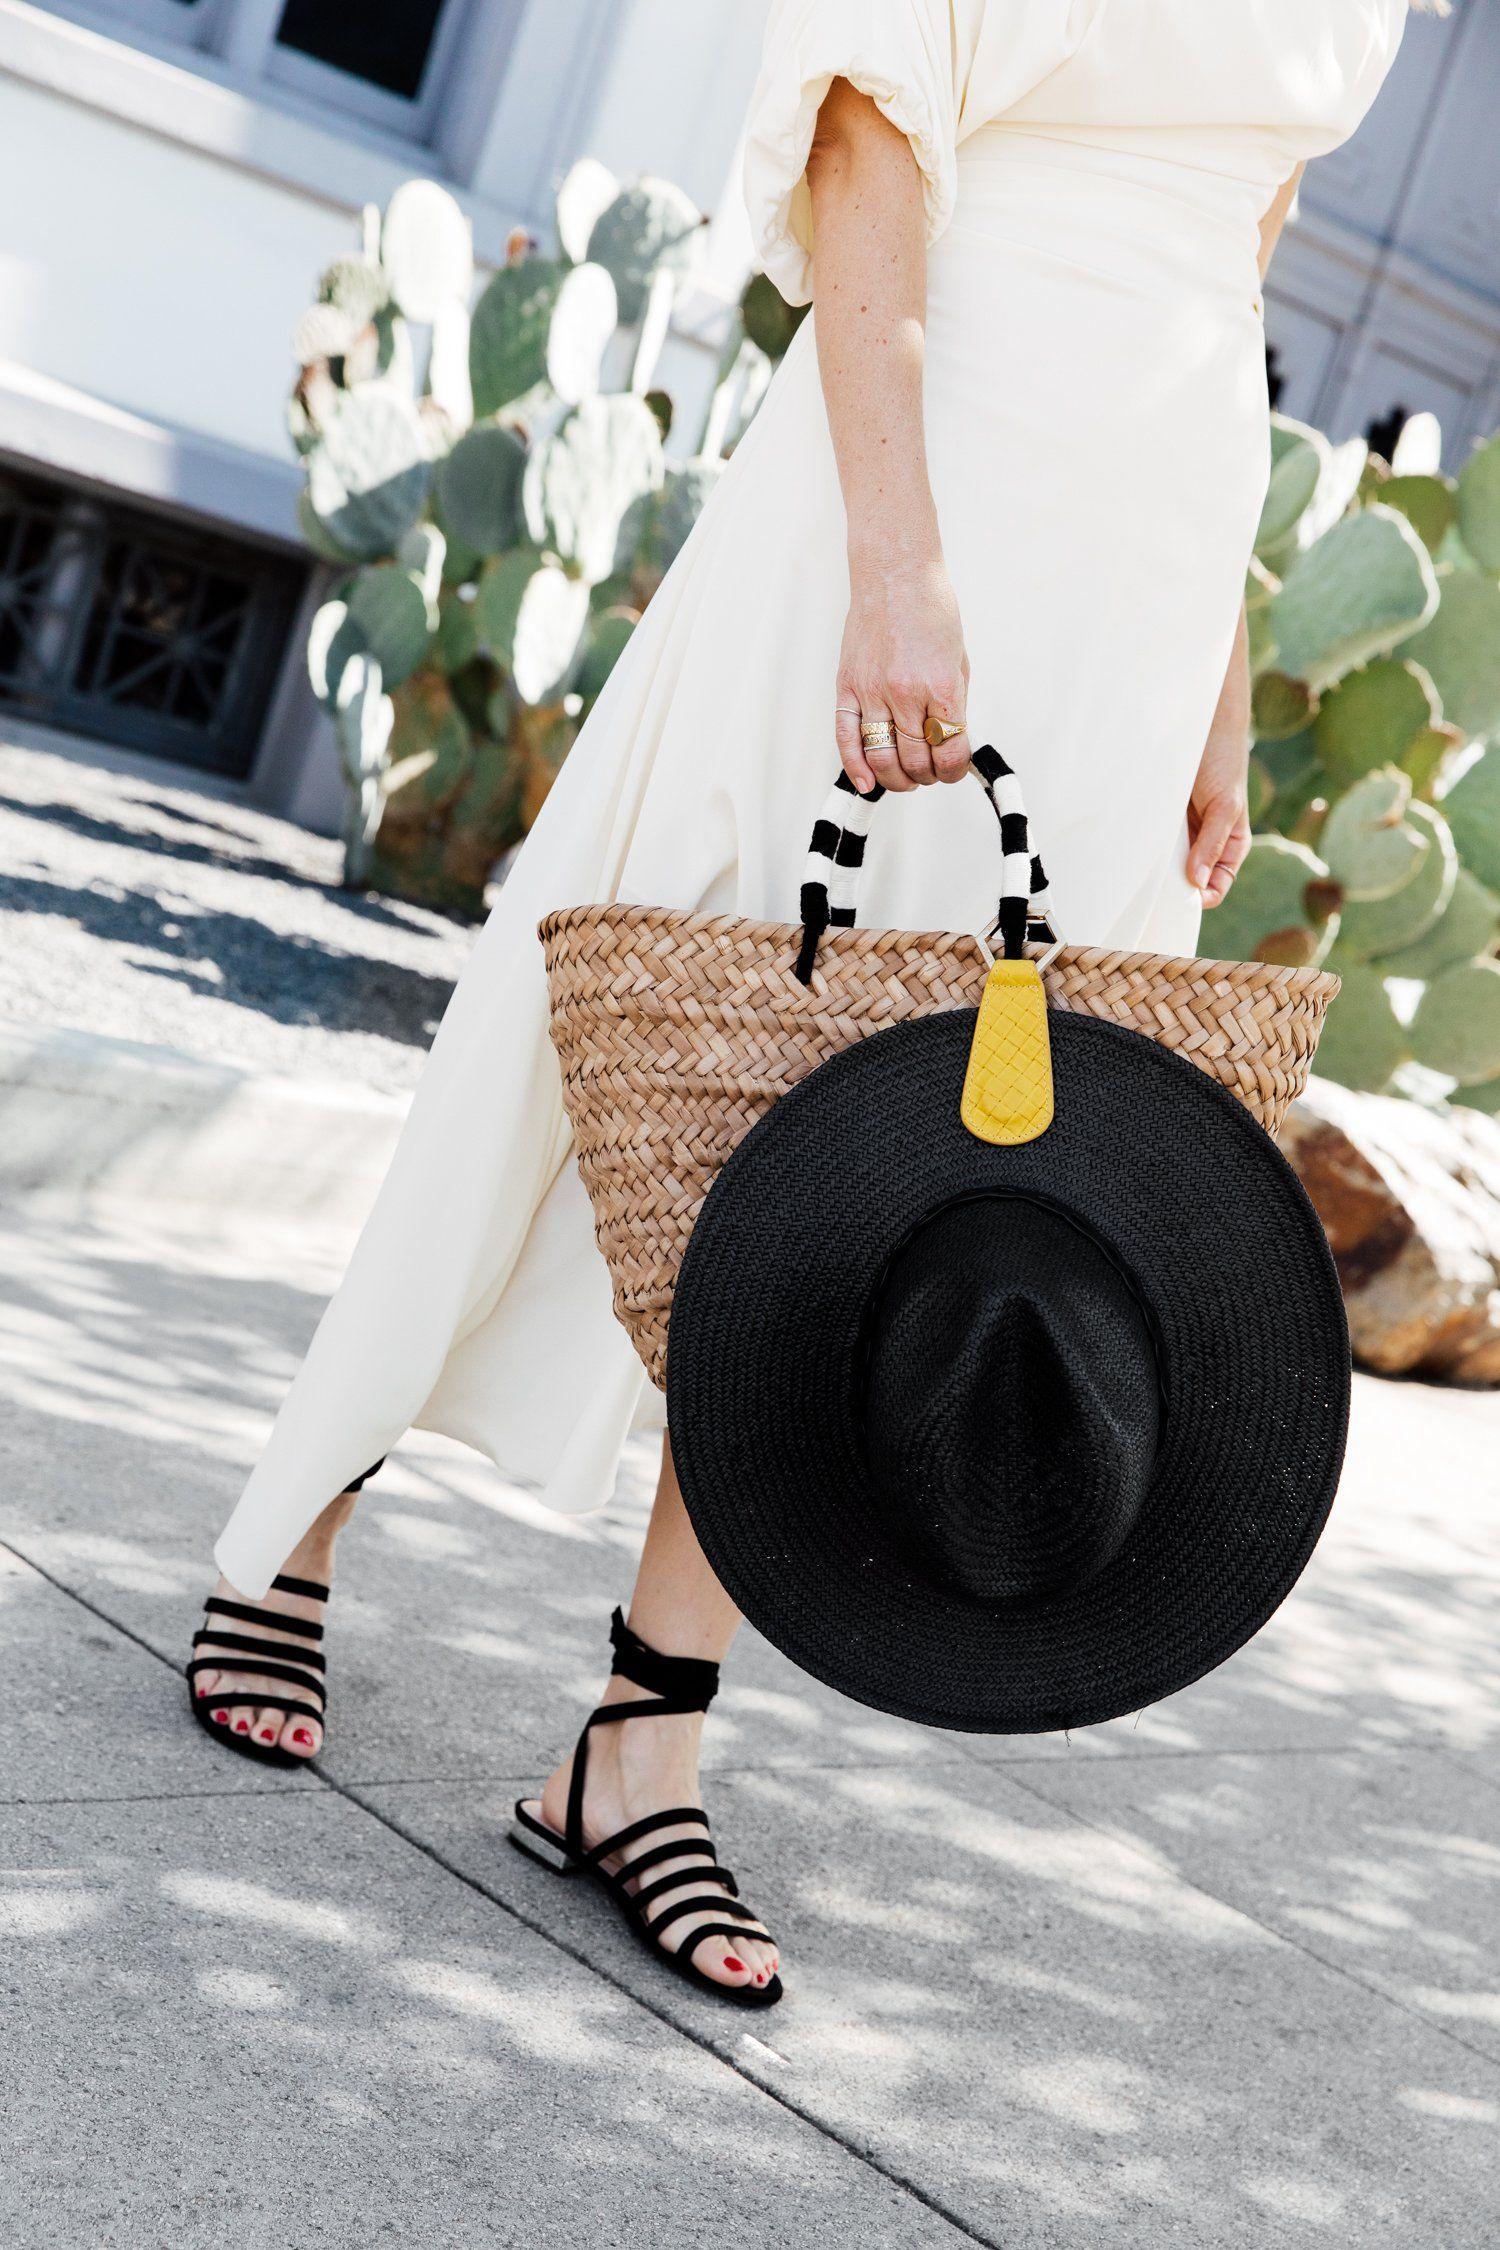 The Drop Toptote Hat Holder Lindsay Albanese In 2021 Handbag Straps Hat Holder Leather Protectant